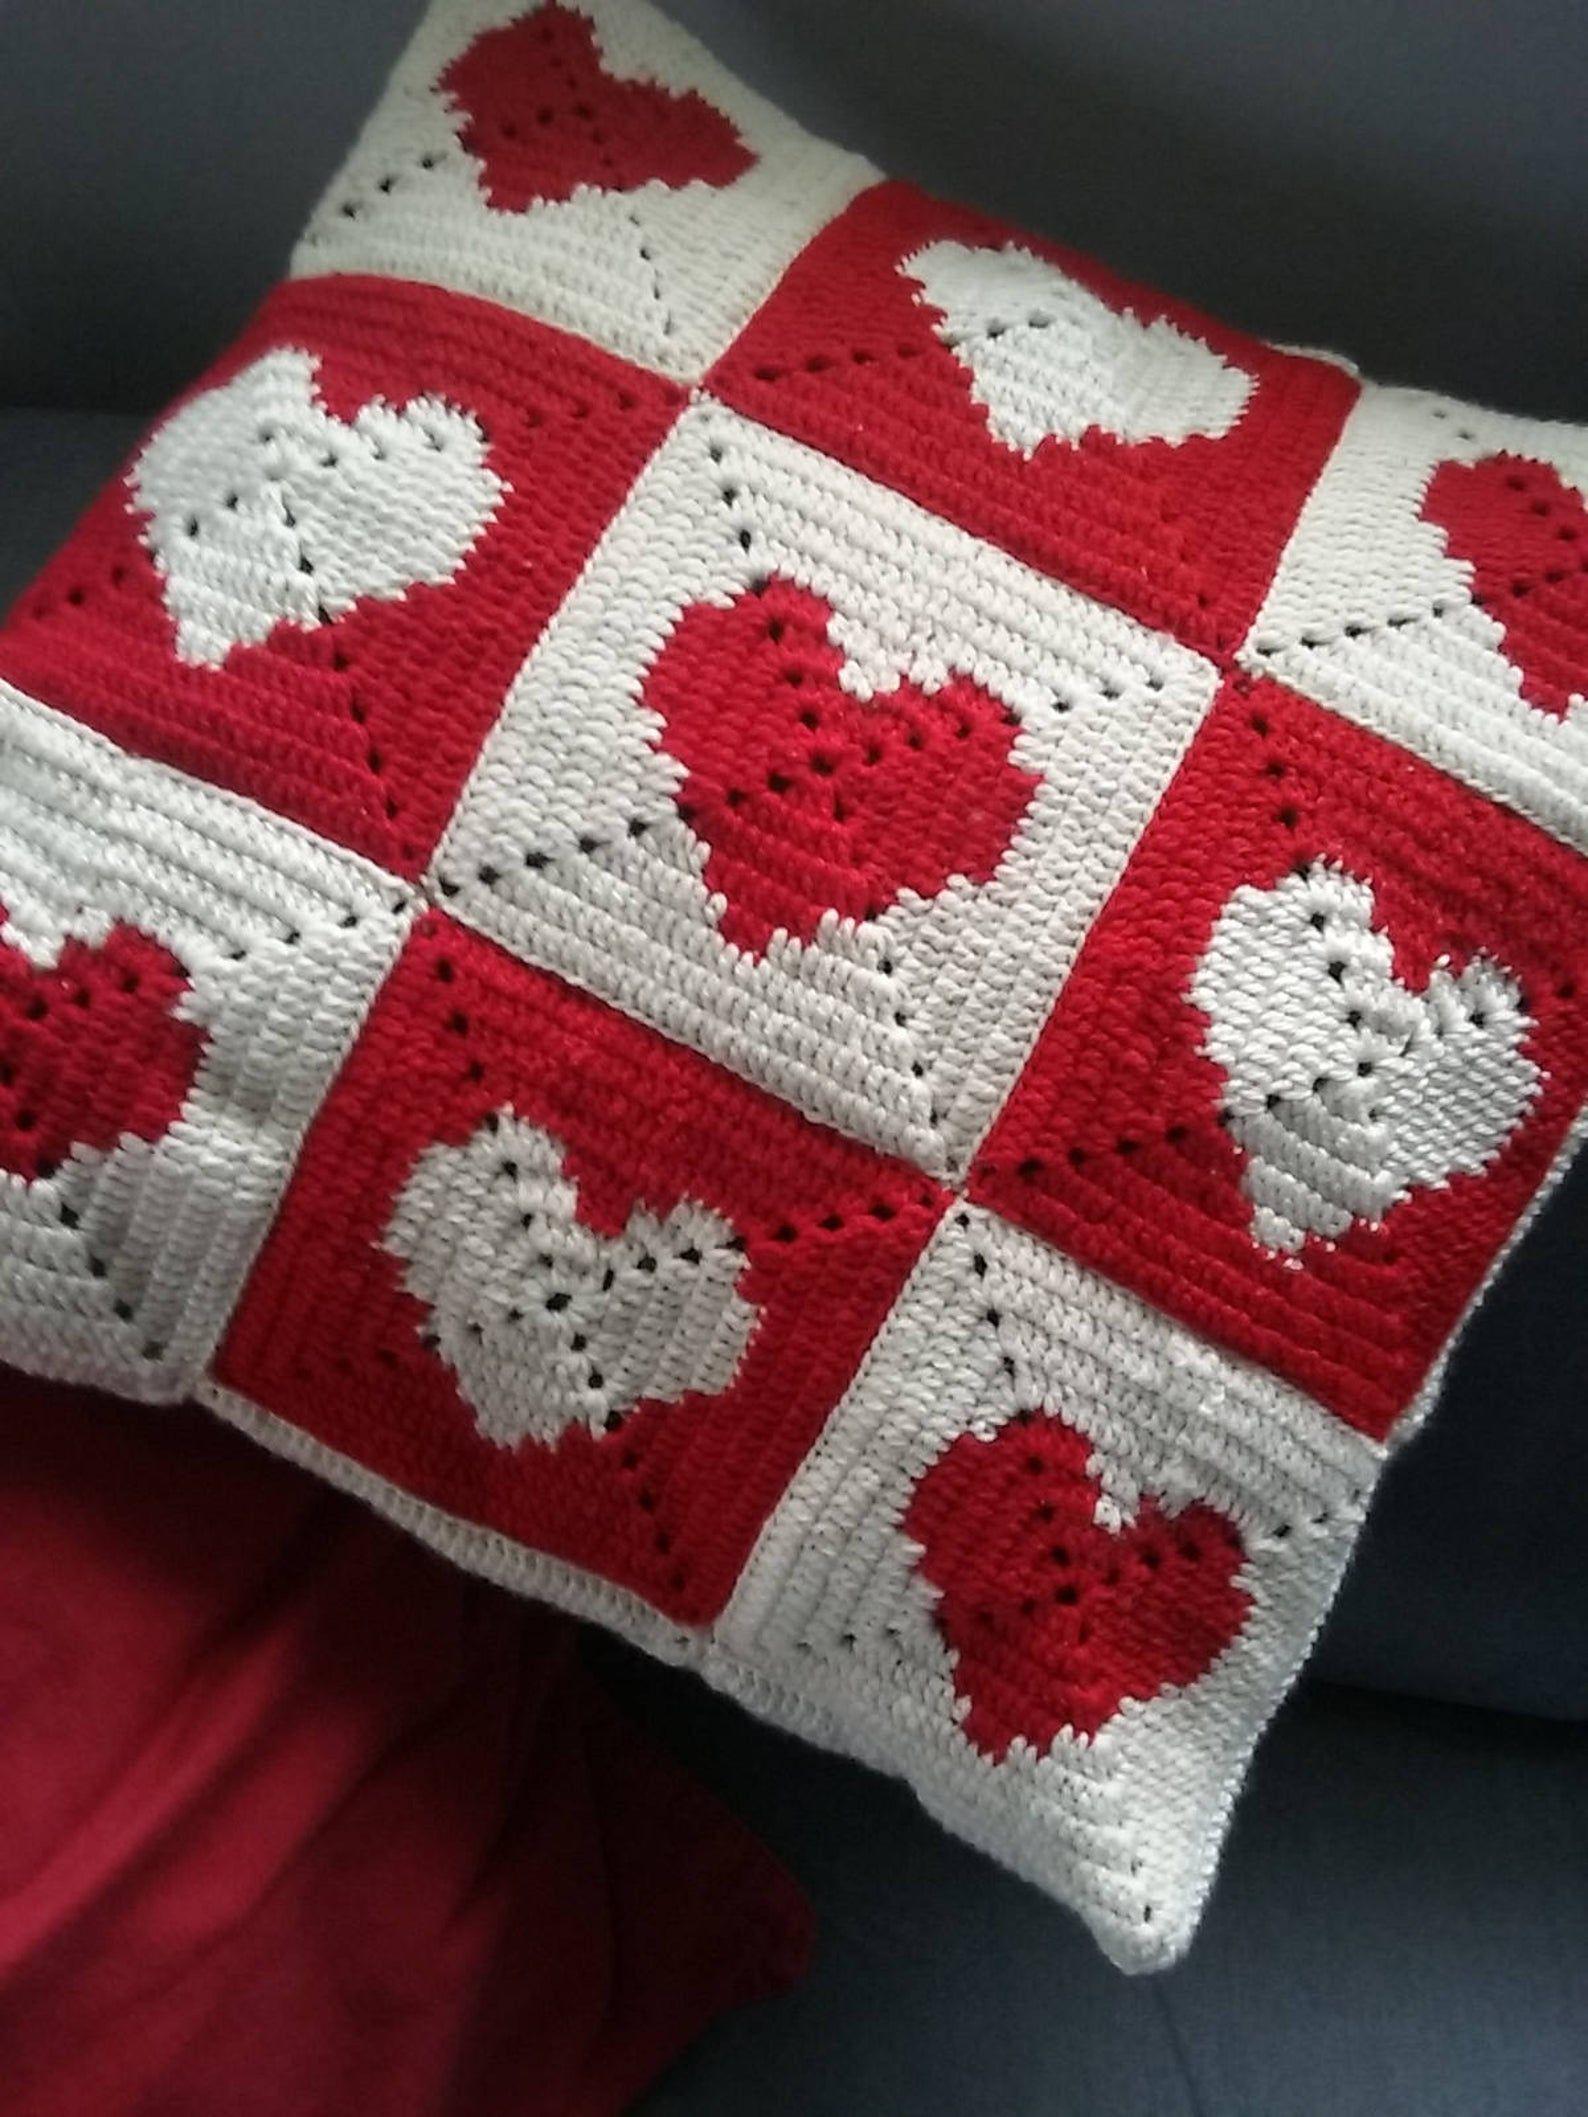 Free Shippingcrochet Pillow Cover With Heartscrochet Pillow Etsy